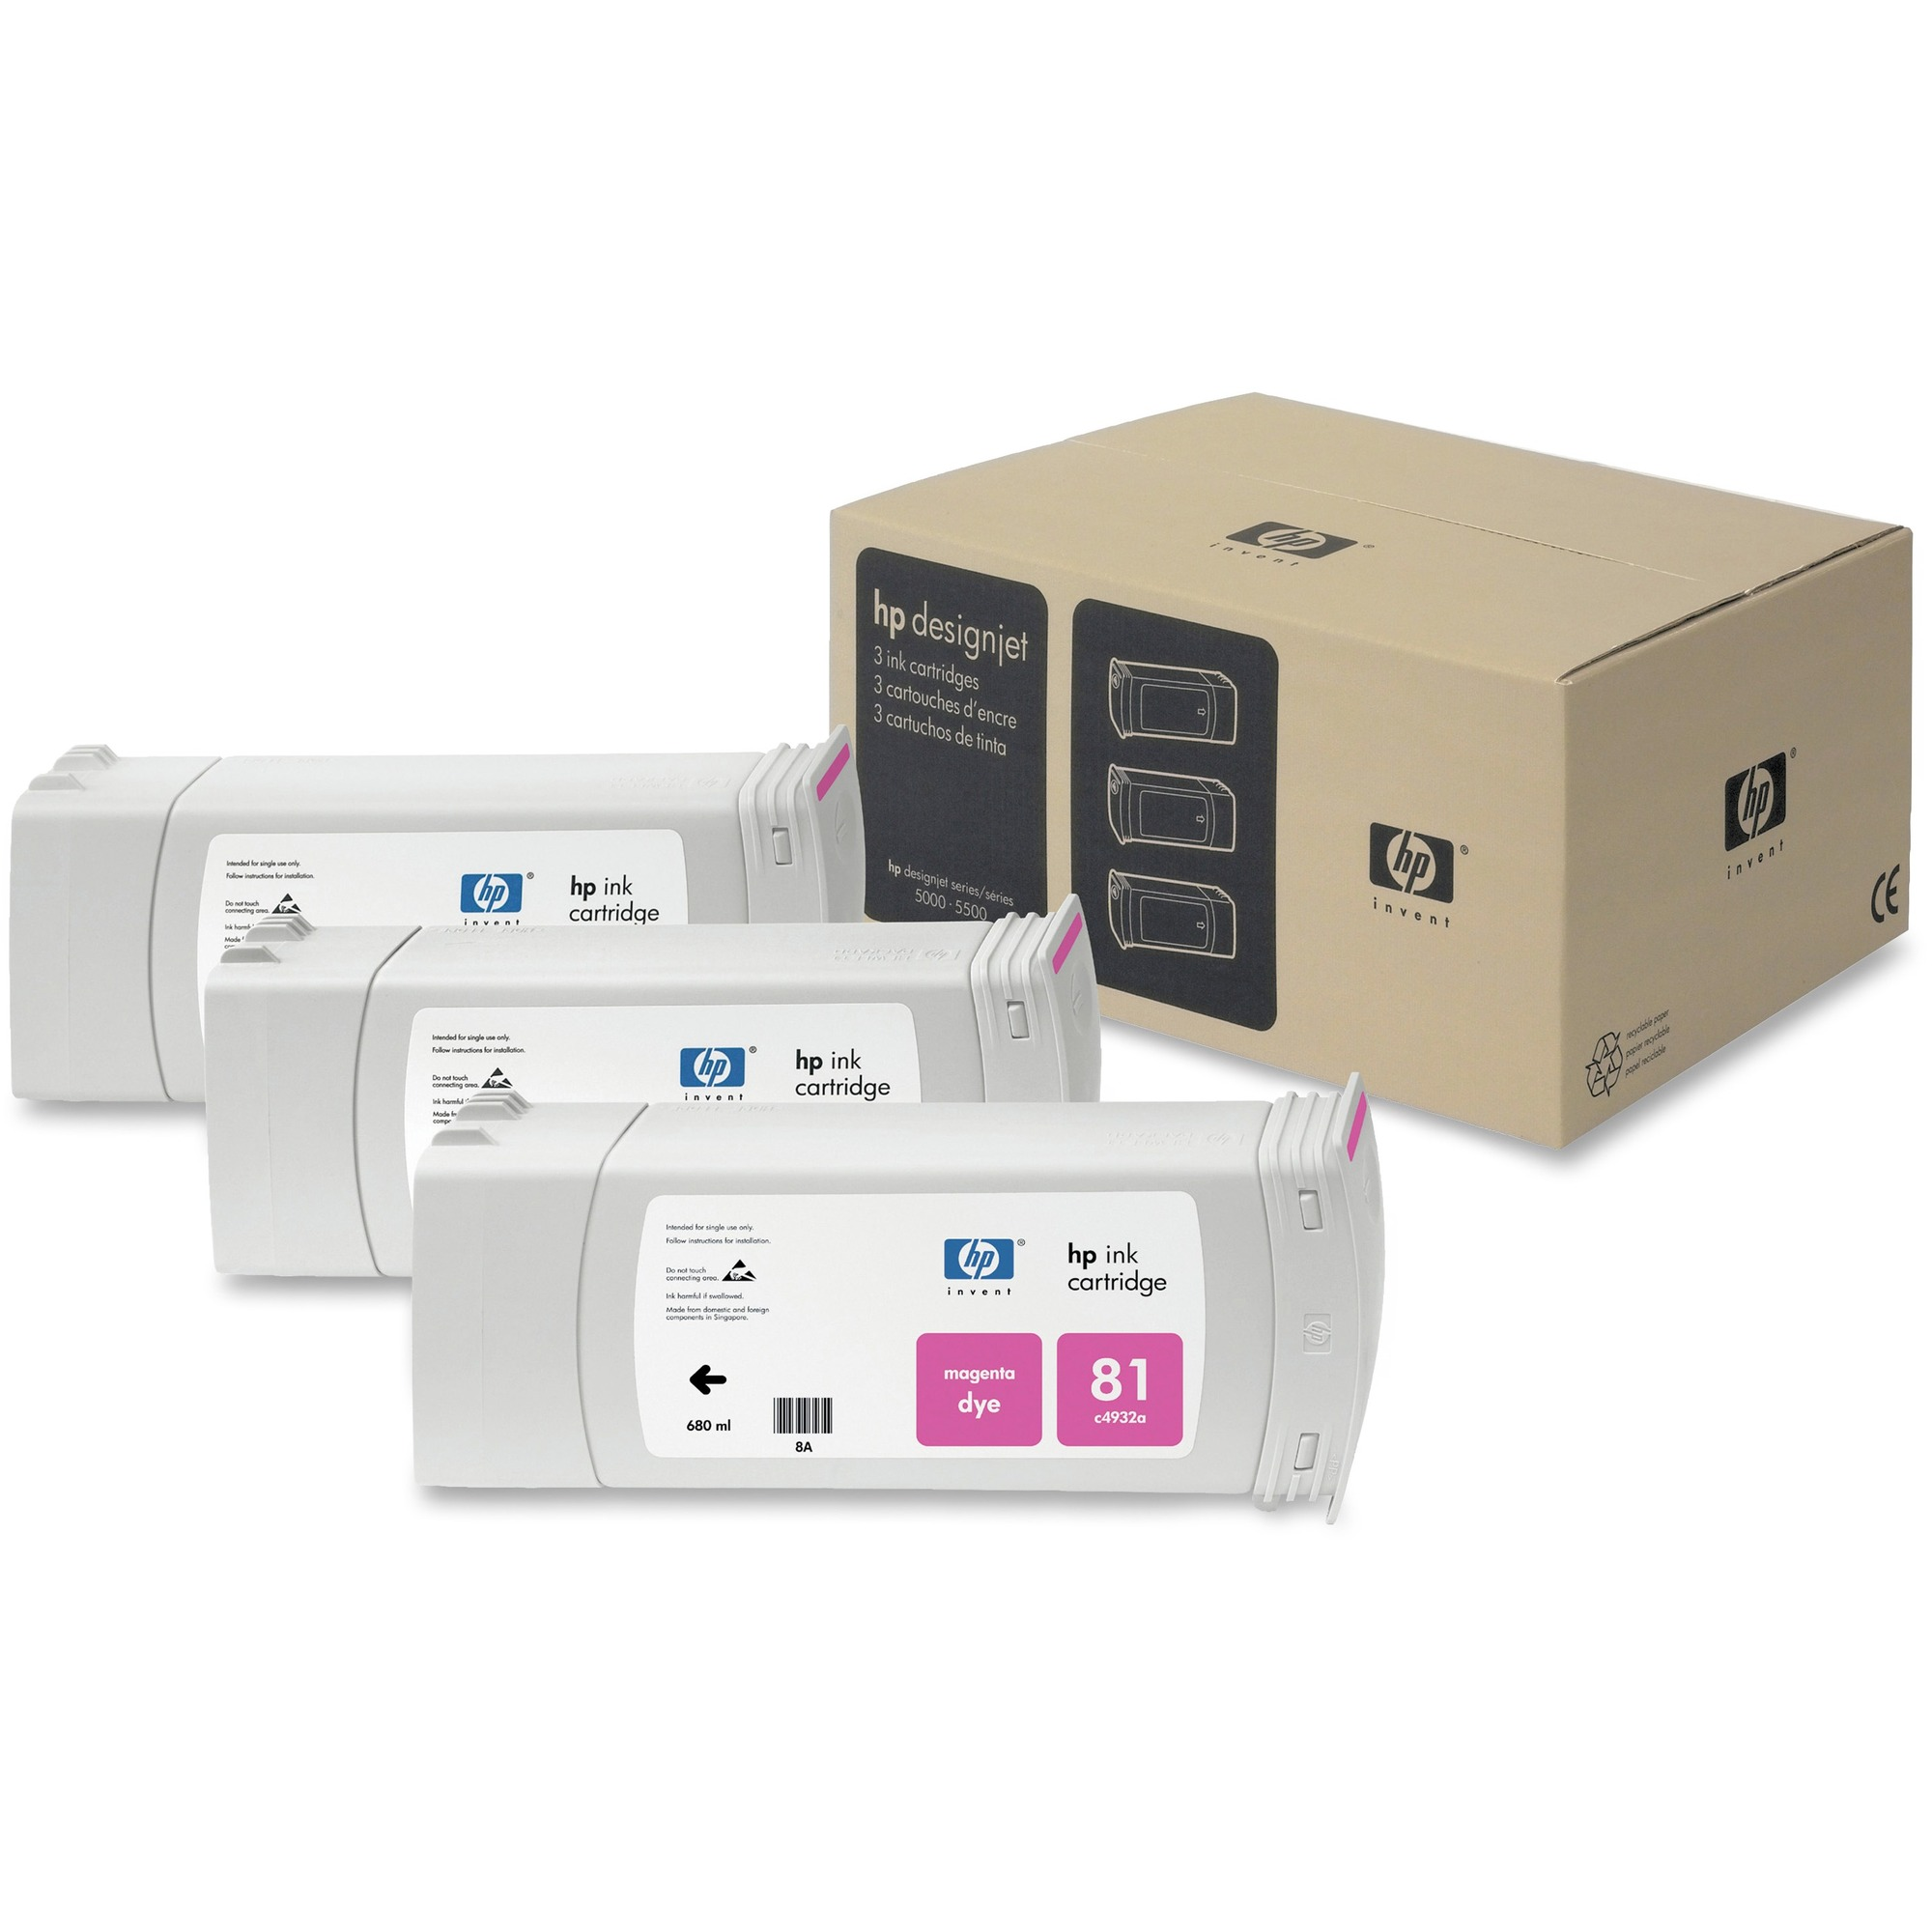 HP No. 81 Magenta Ink Cartridge x3 Pack